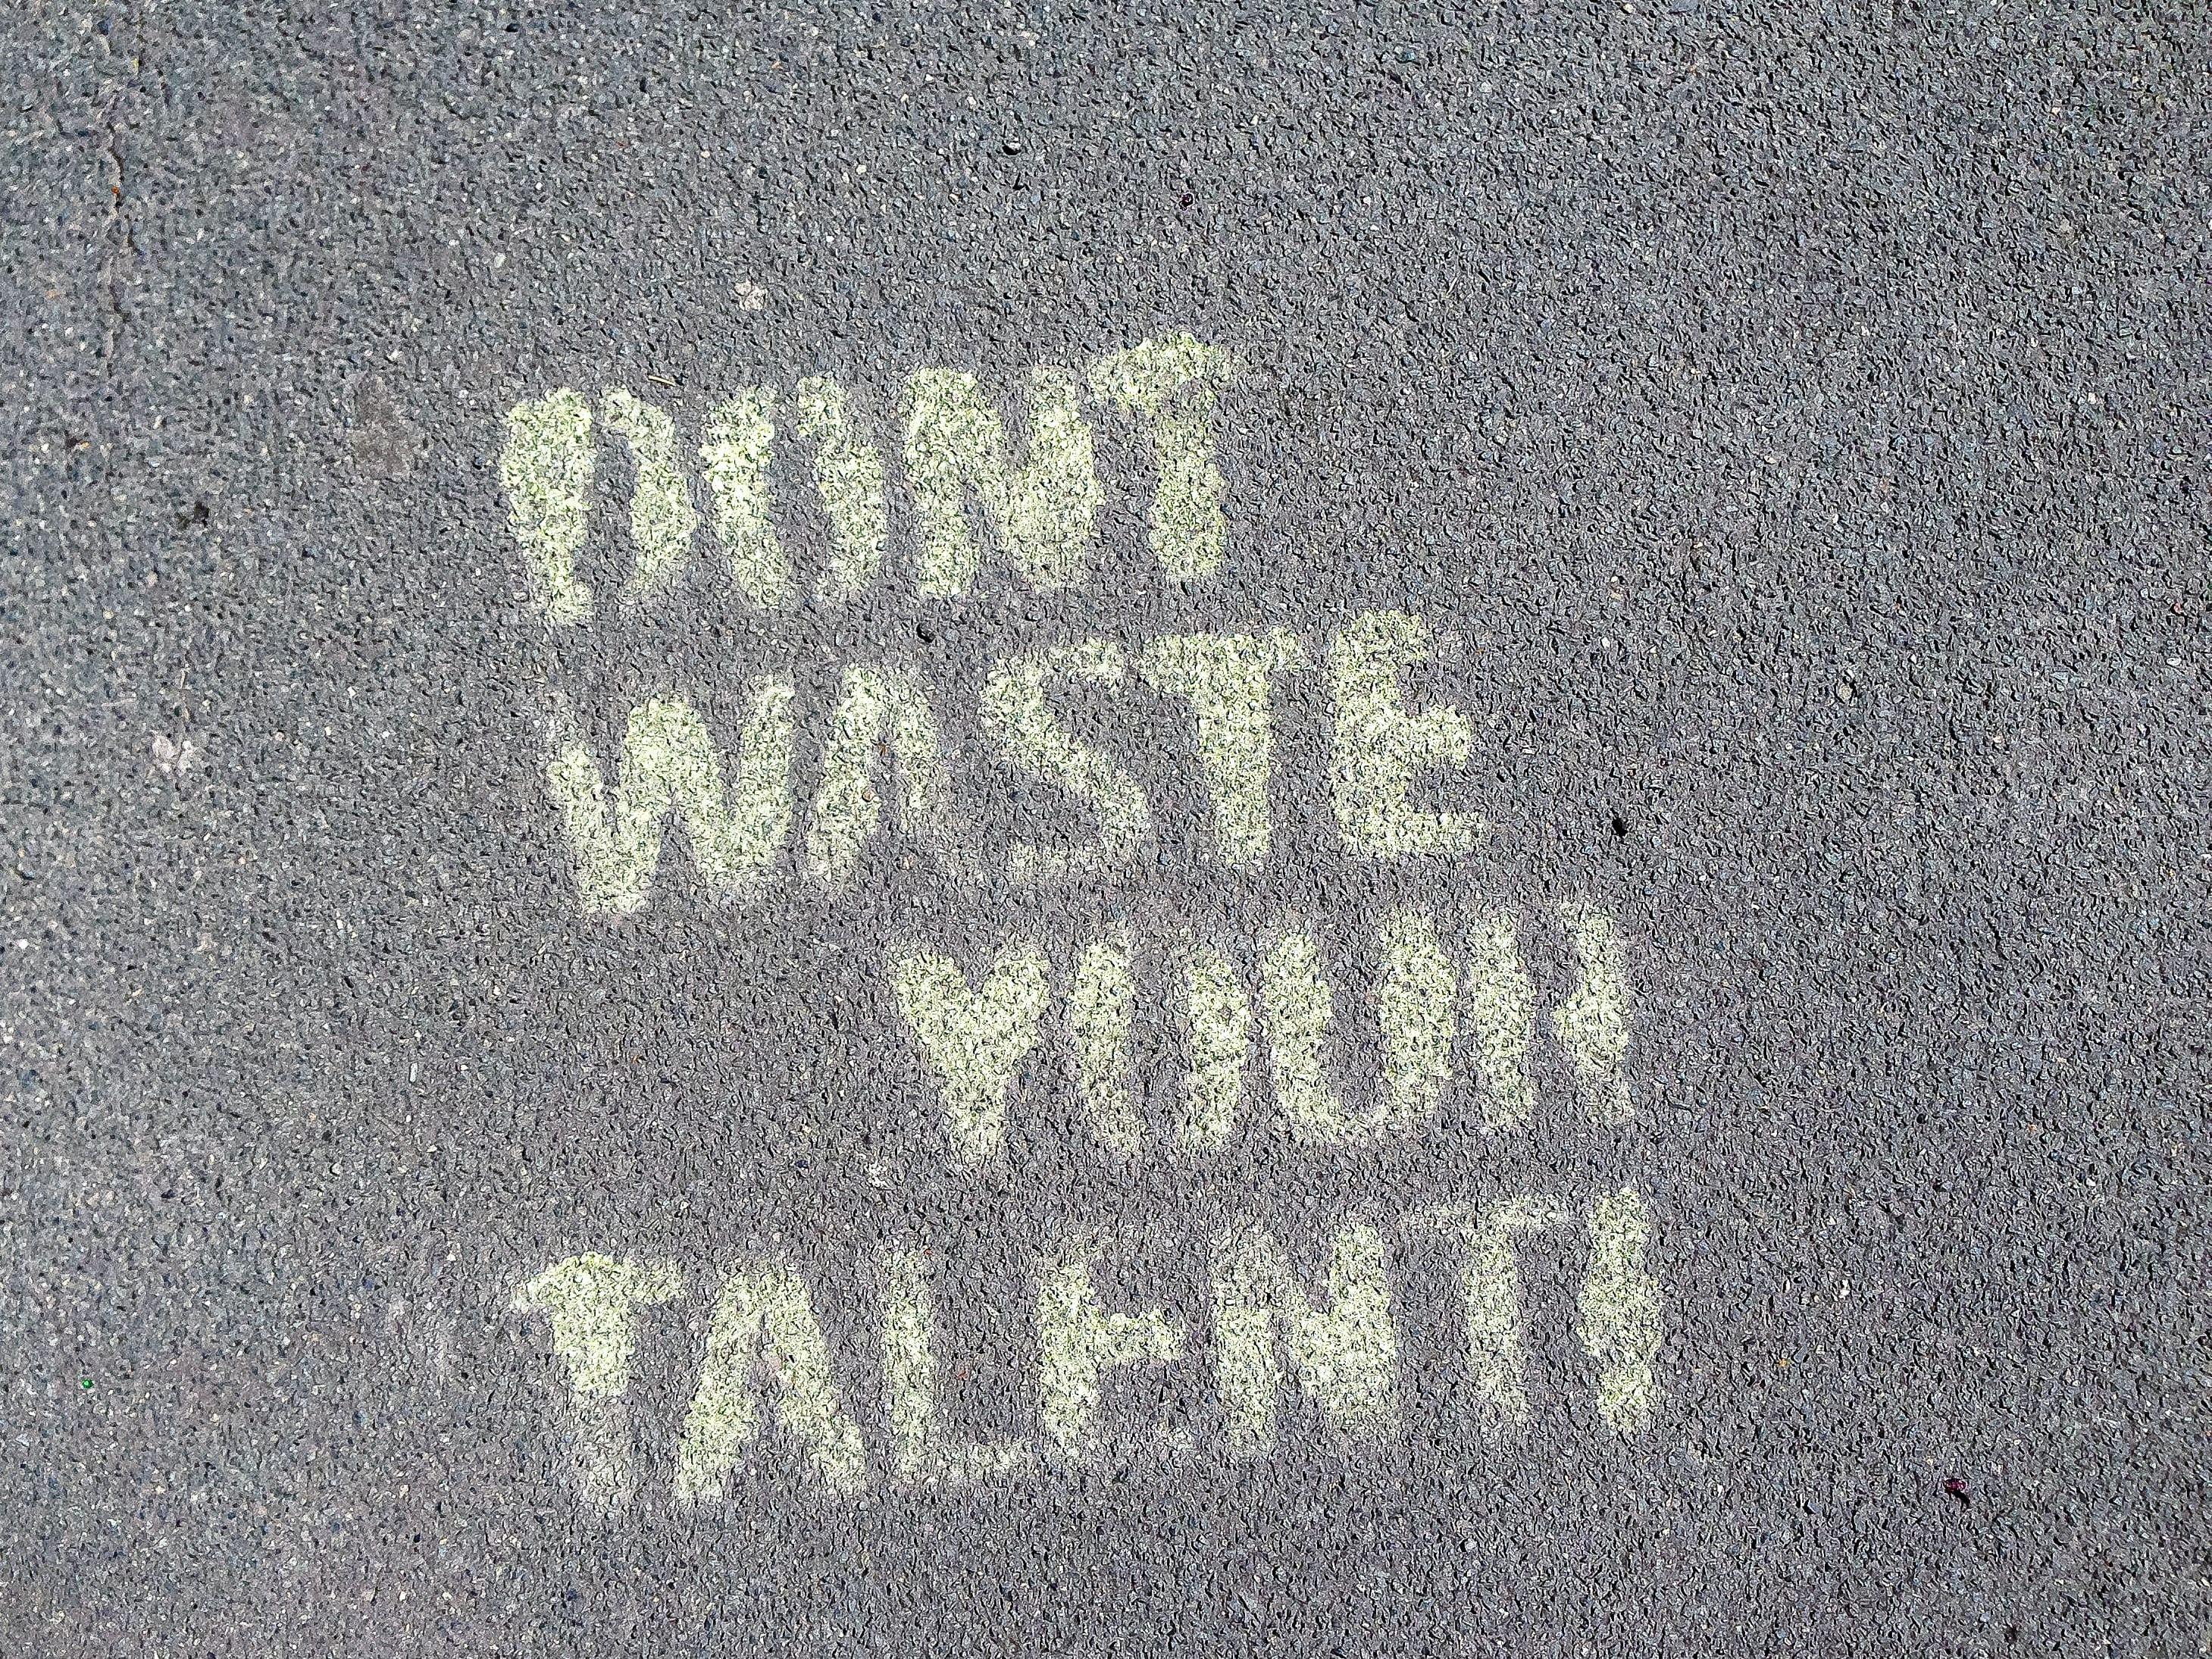 freelance writing niches - slogan writer